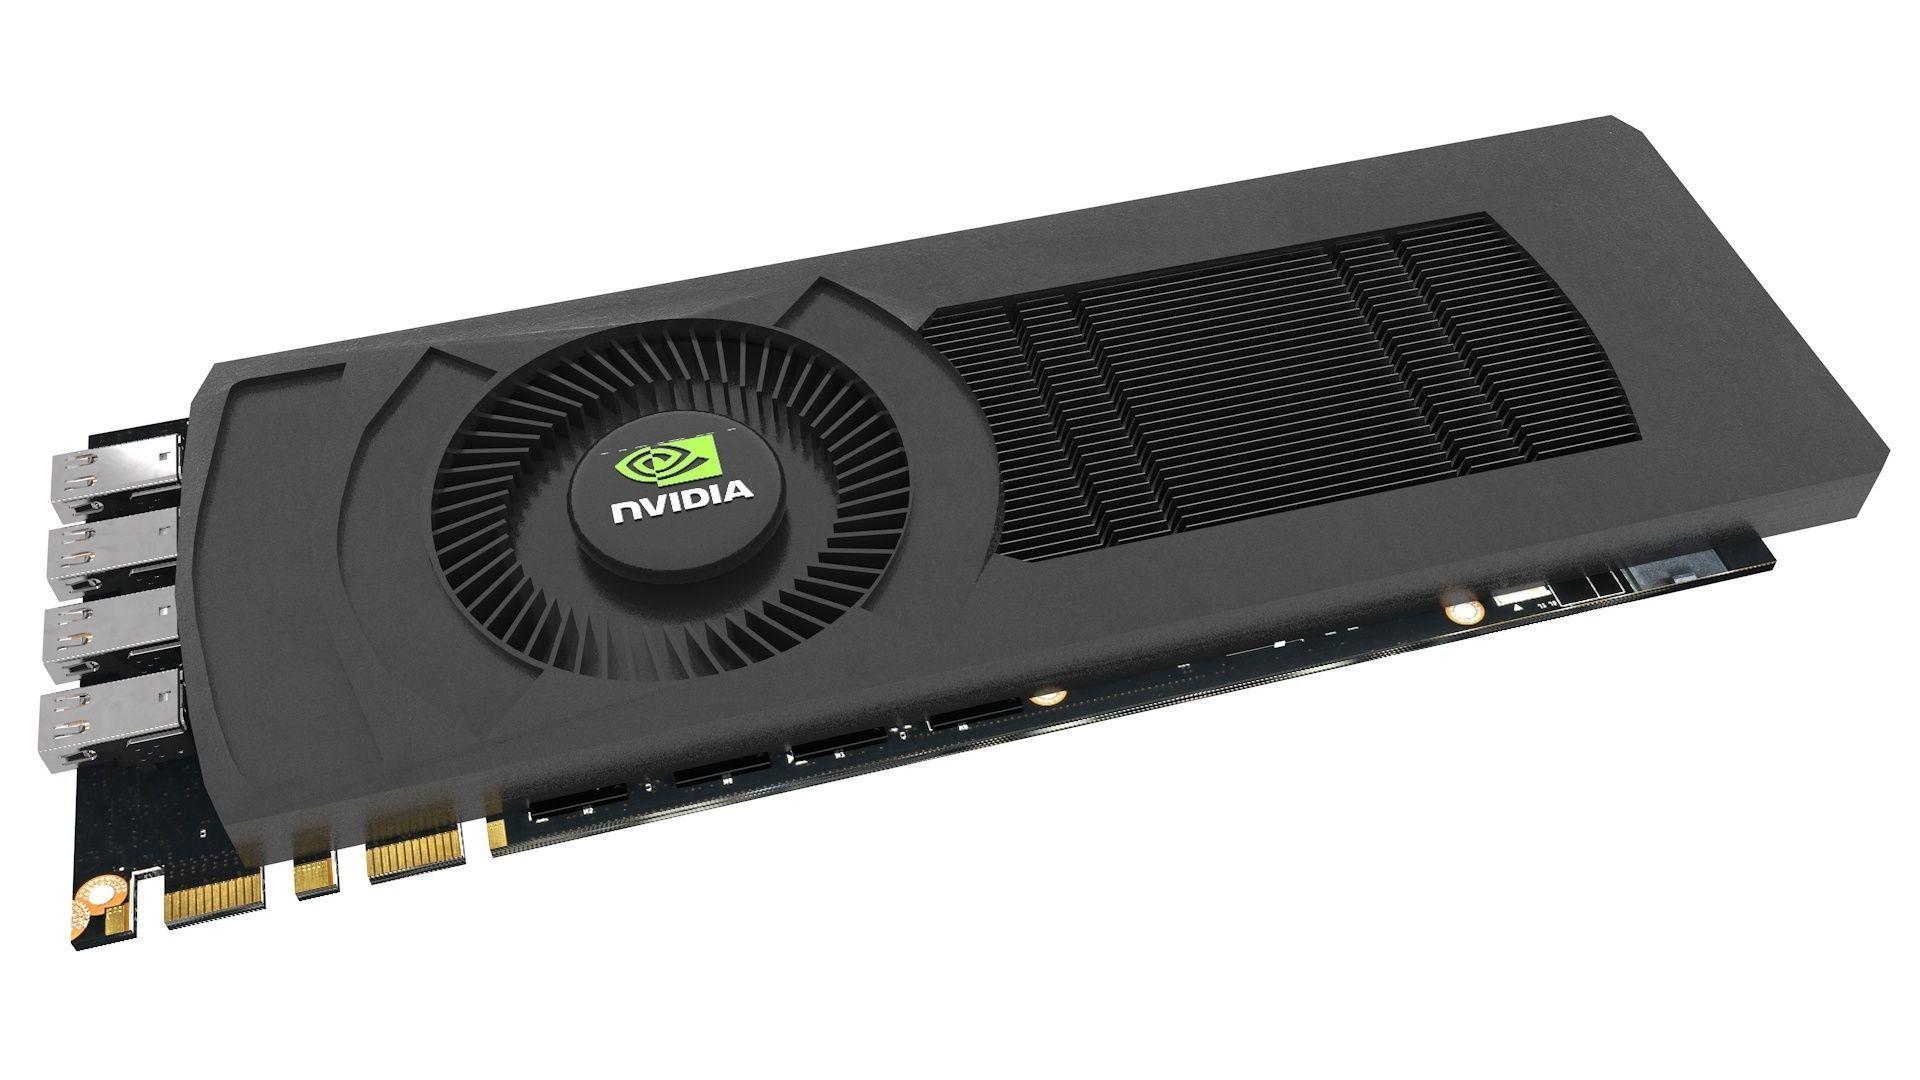 Graphic Card Nvidia detailed PCB PCI-E Display Port